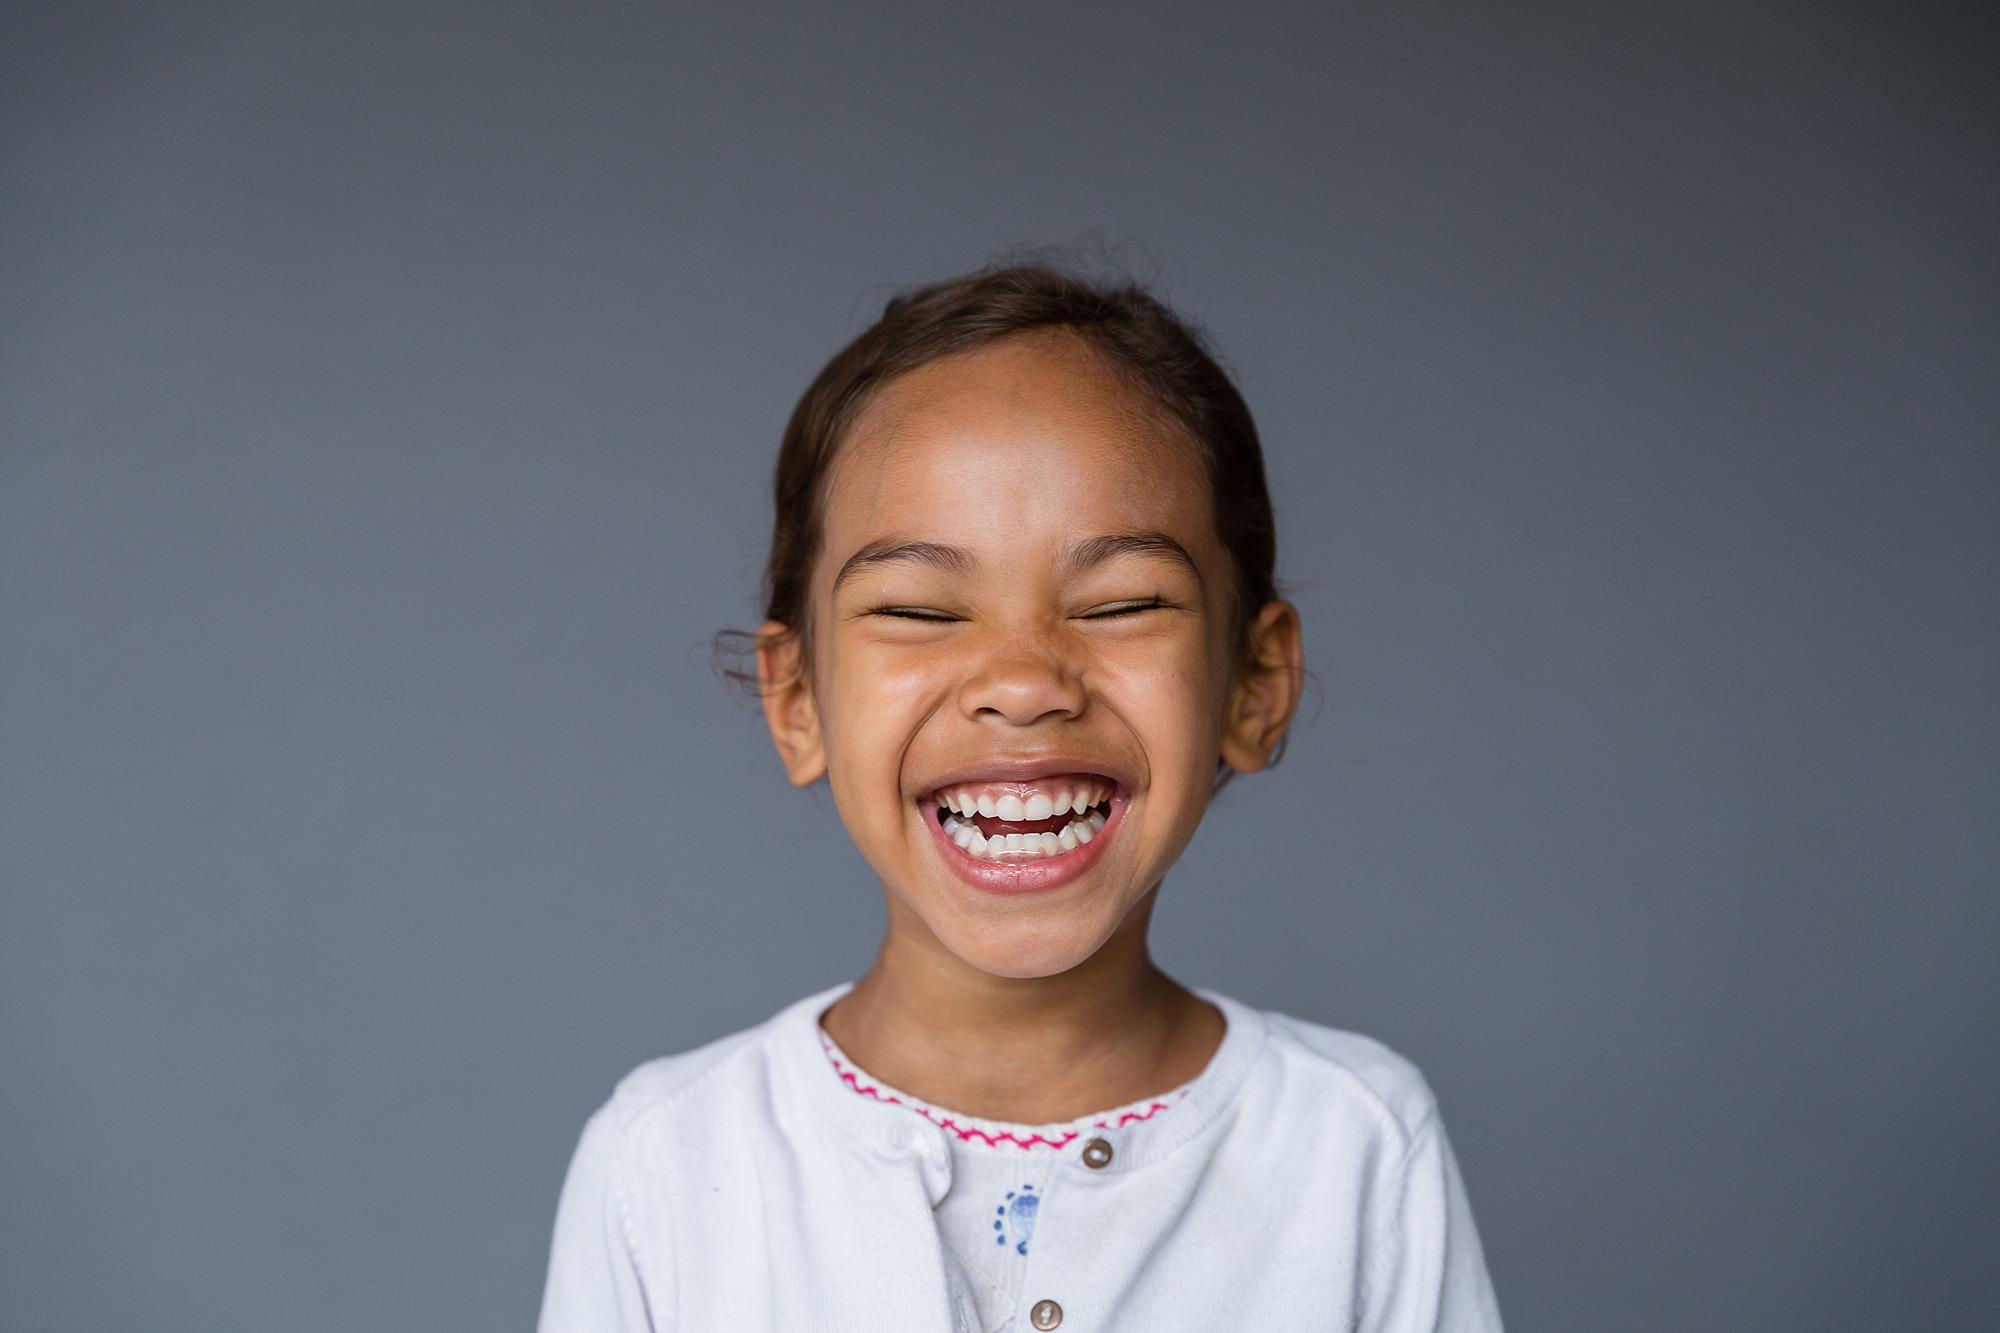 Modern_Childrens_Portraits_Hunnicutt_Photography_Collages_0002